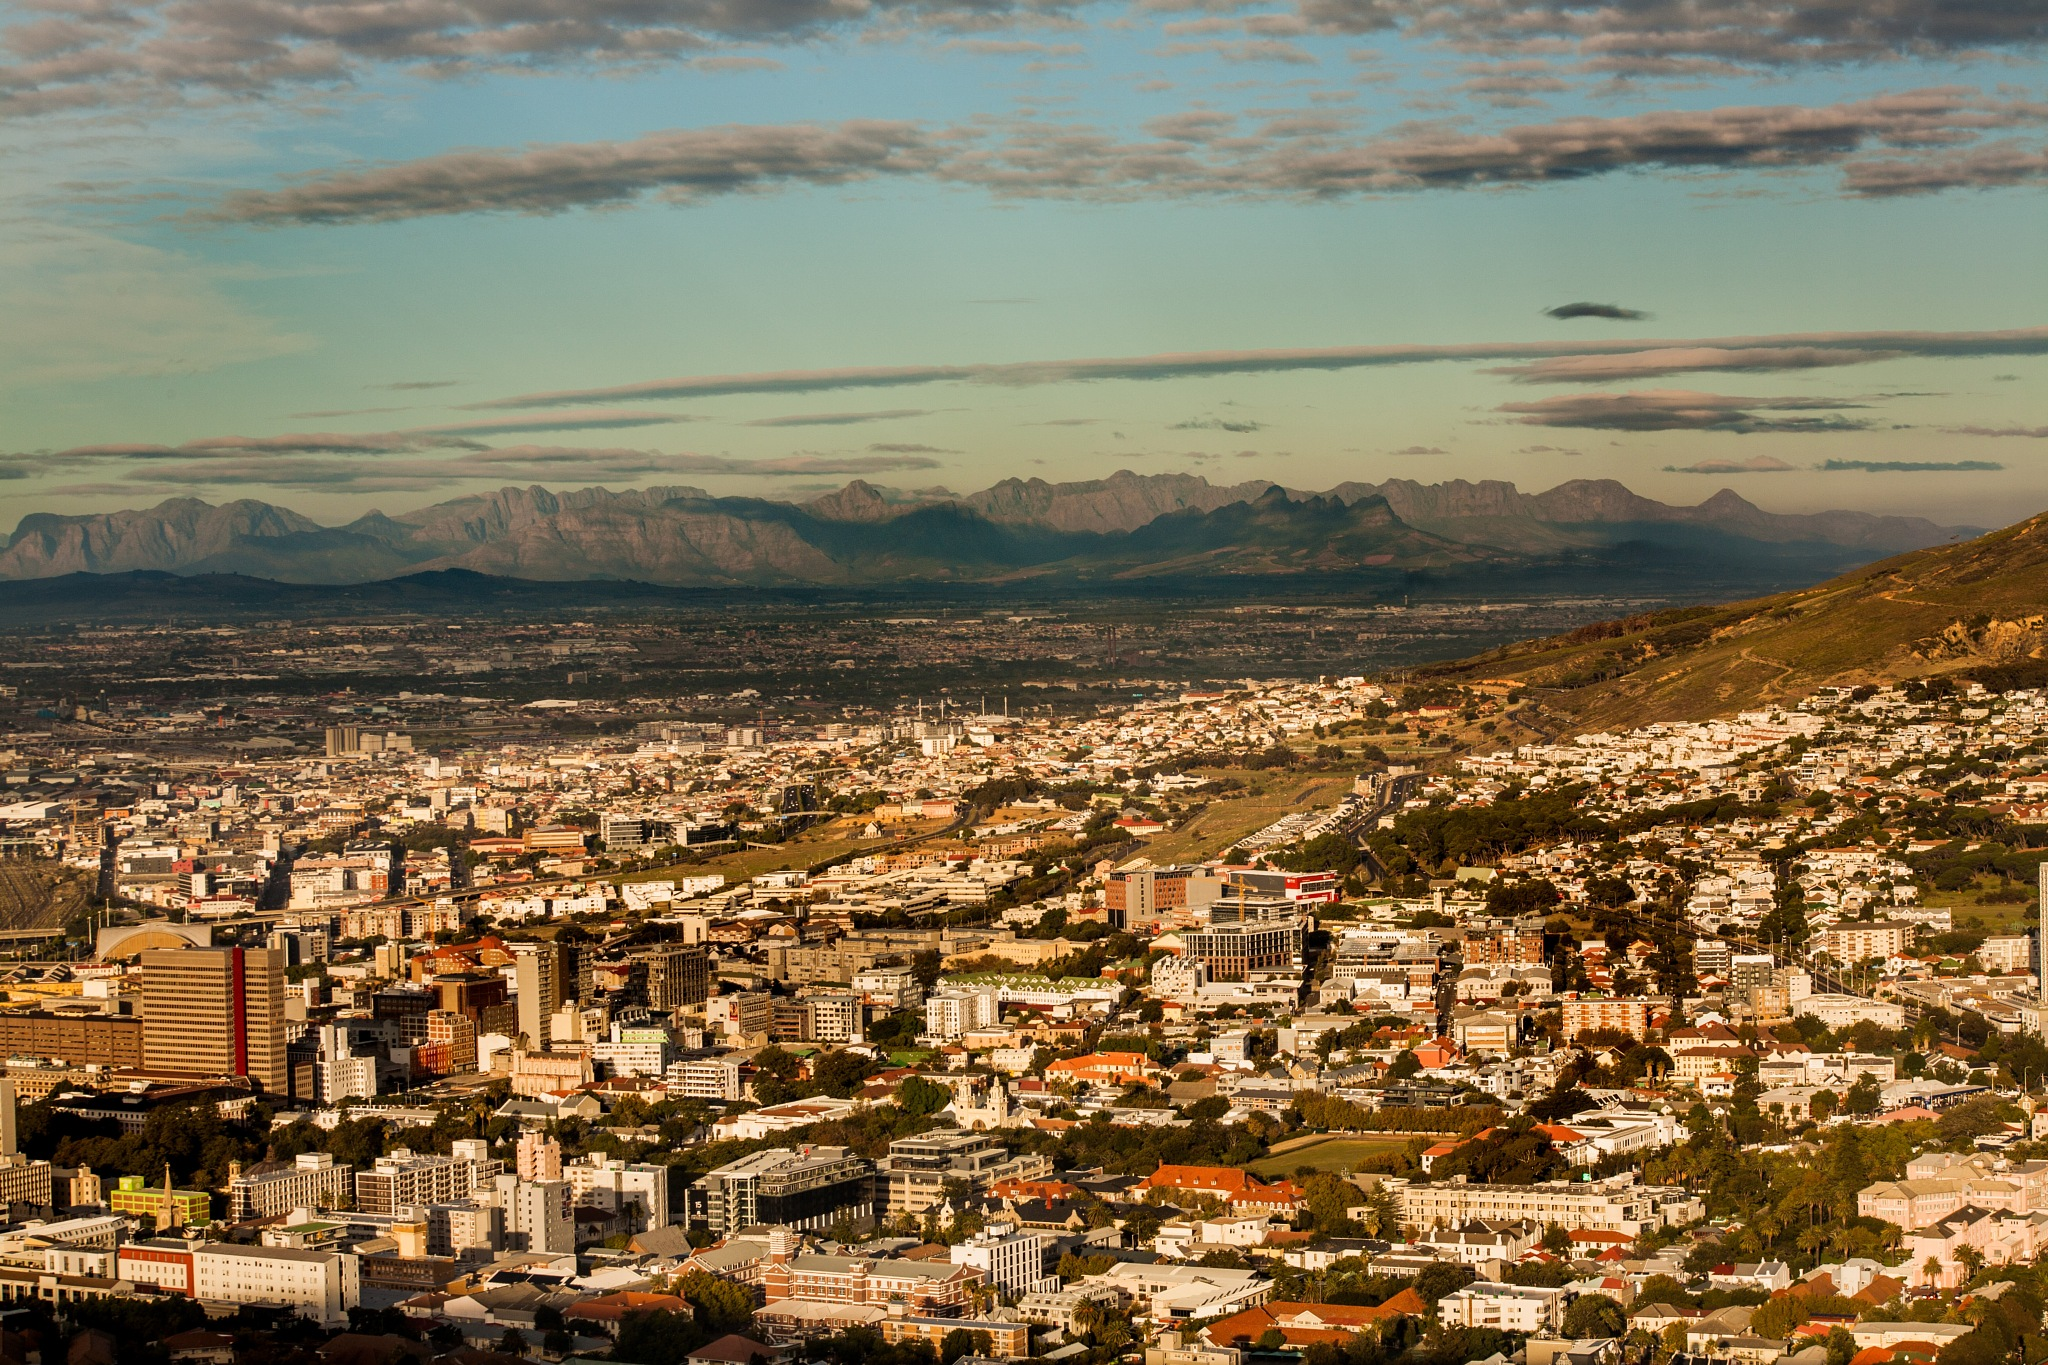 City of Cape Town - a bird's eye view by Nauta Piscatorque